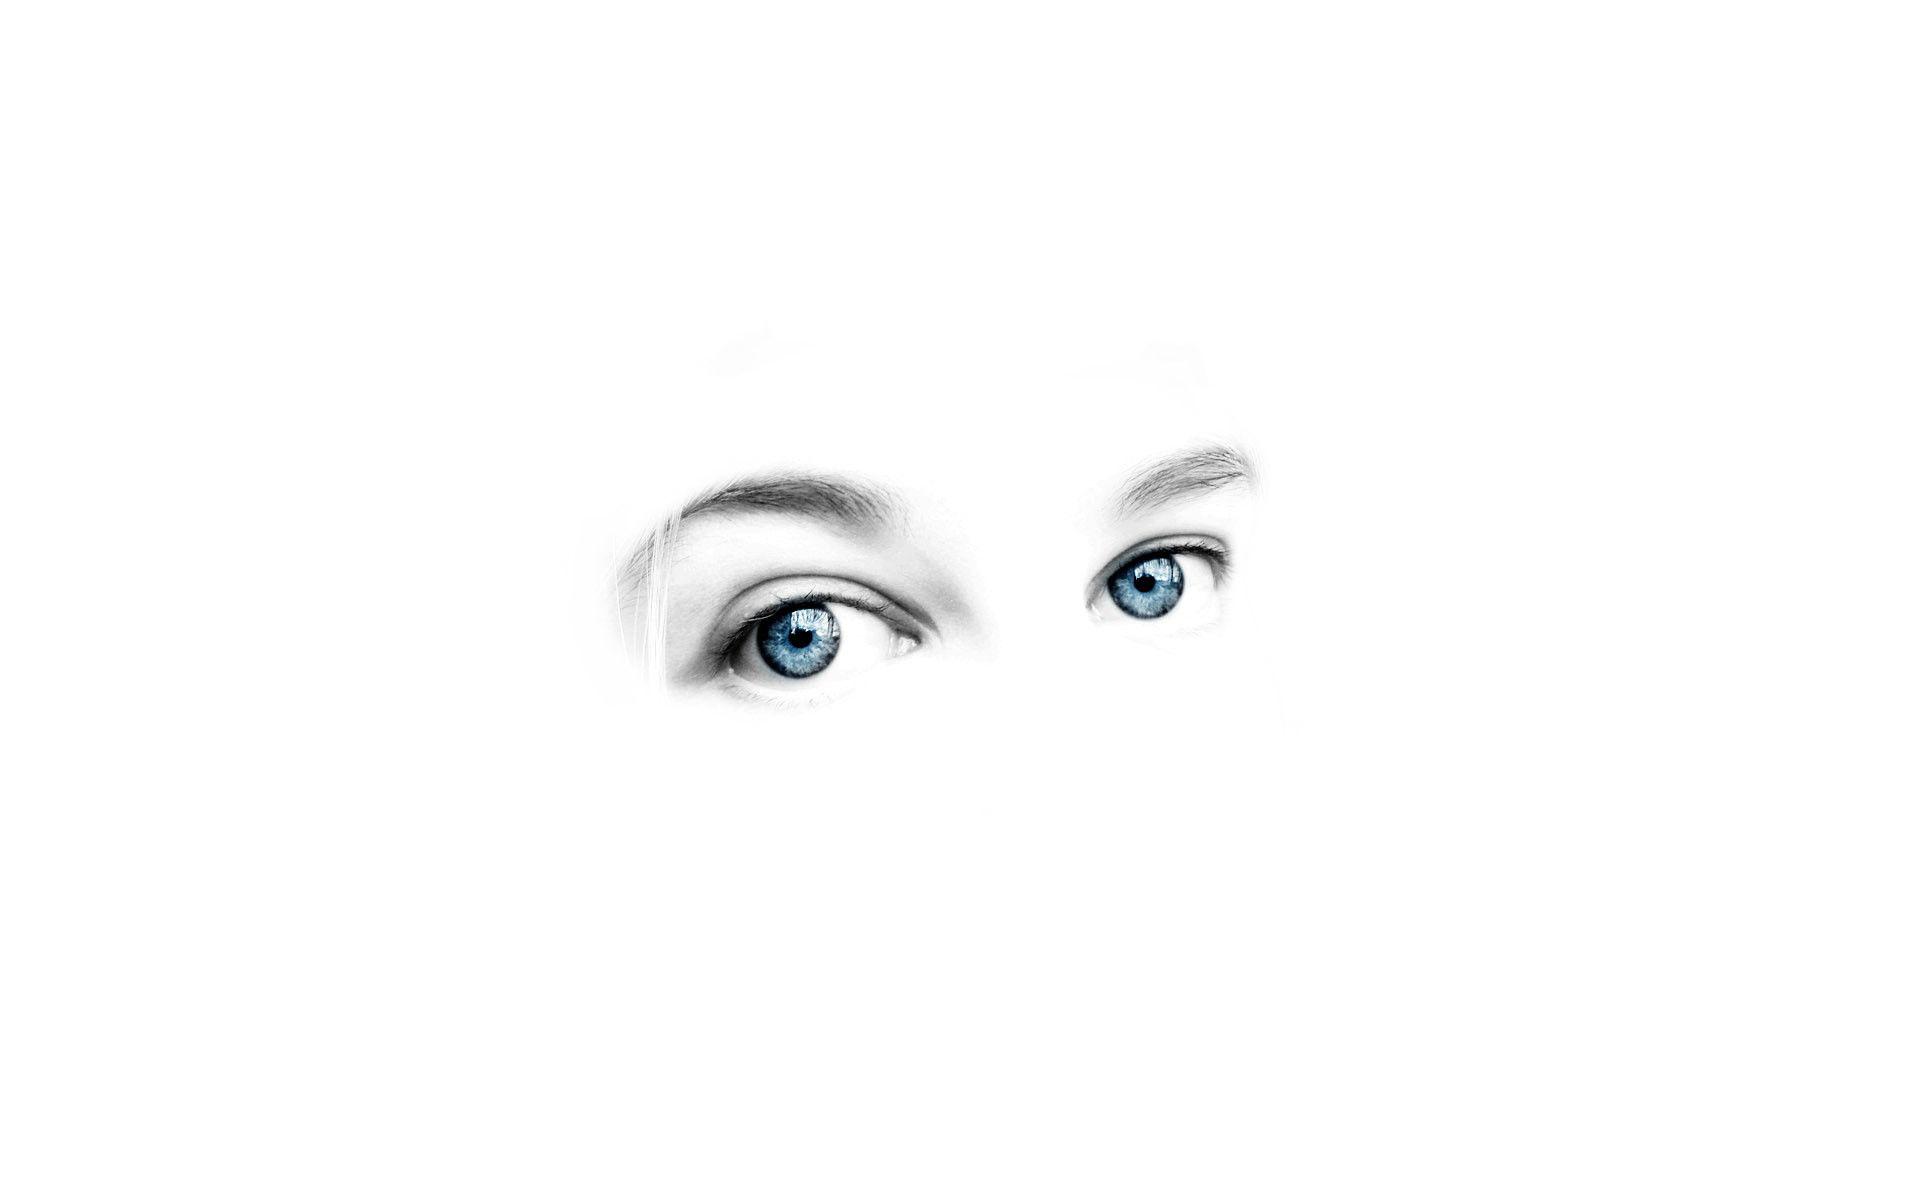 1920x1200 White Wallpaper 4 White Wallpaper Plain Eyes Wallpaper White Background Wallpaper